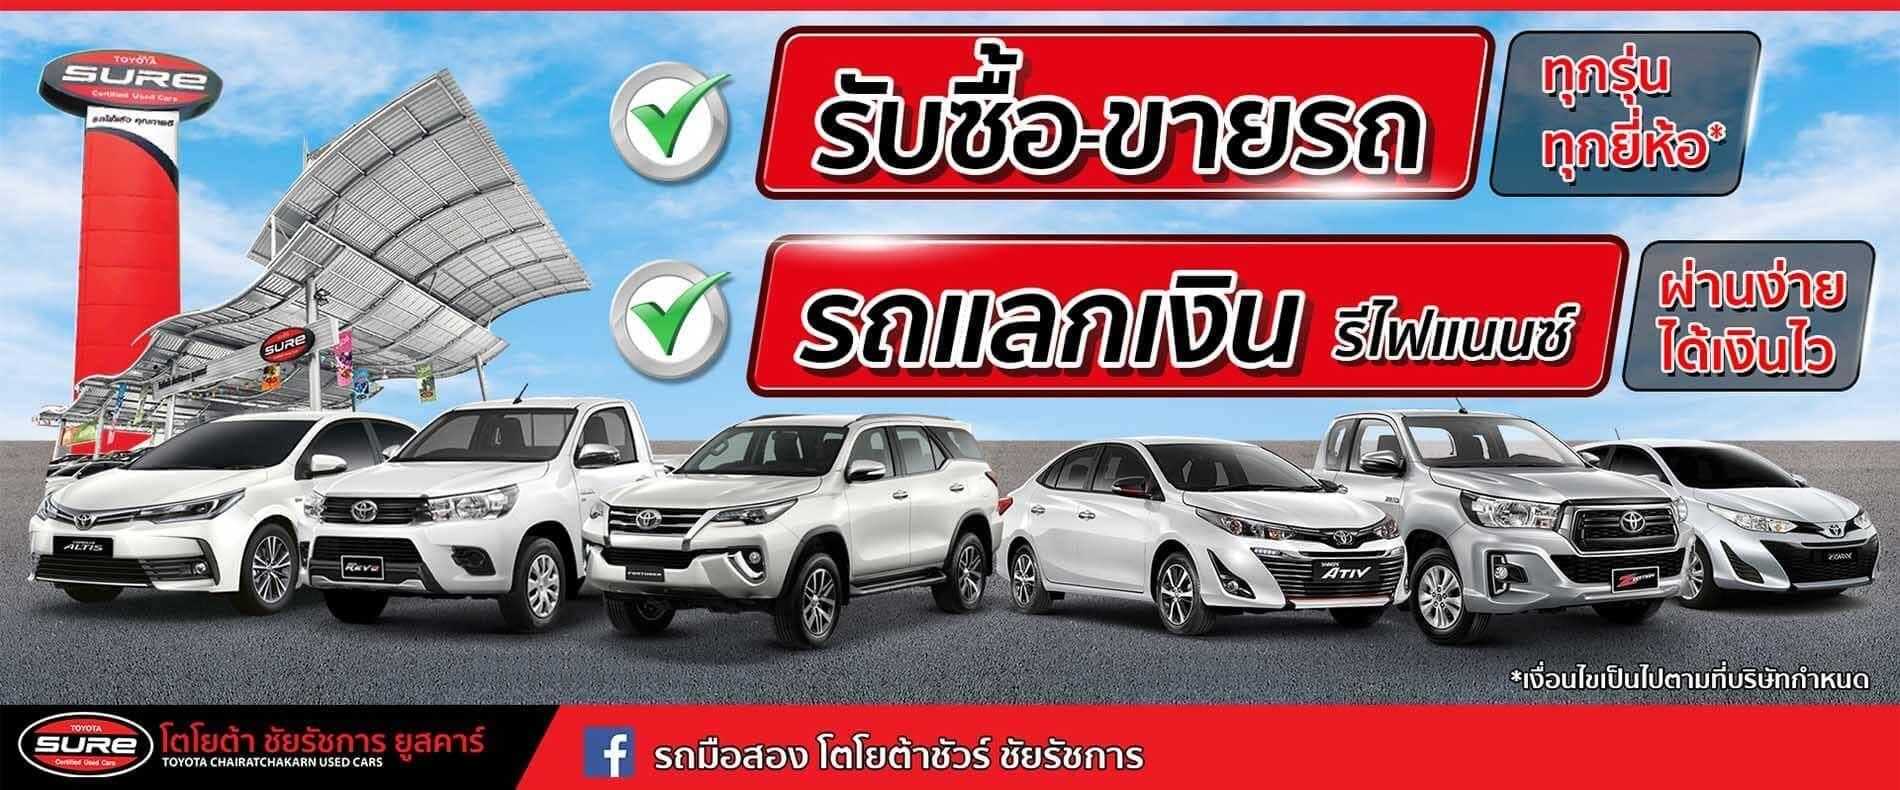 Toyota-Sure